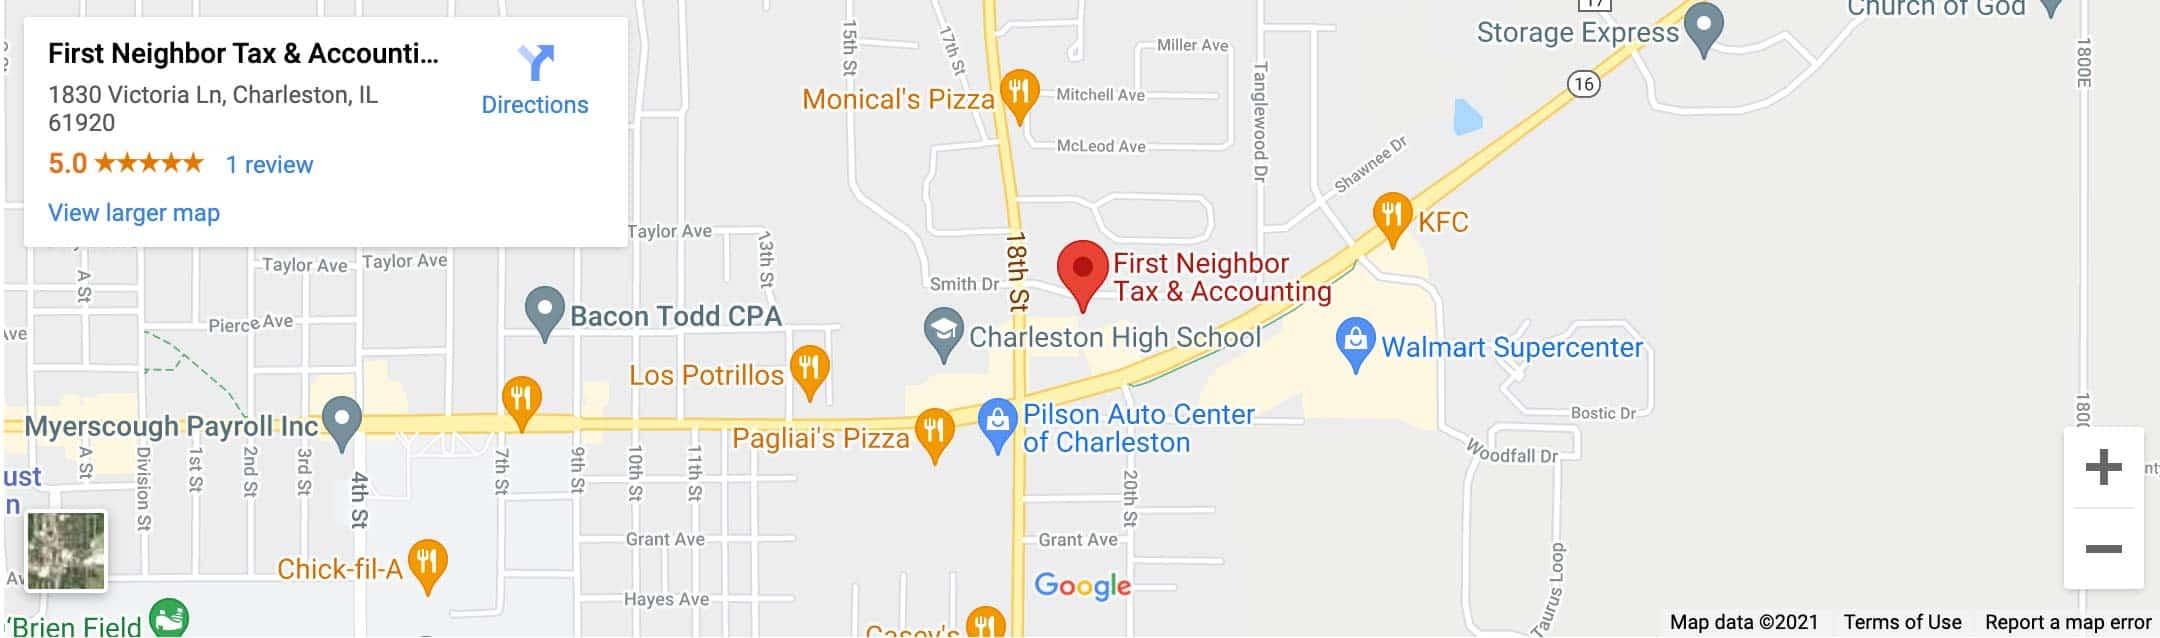 Decorative - First Neighbor Tax & Accounting Charleston Google Map Image